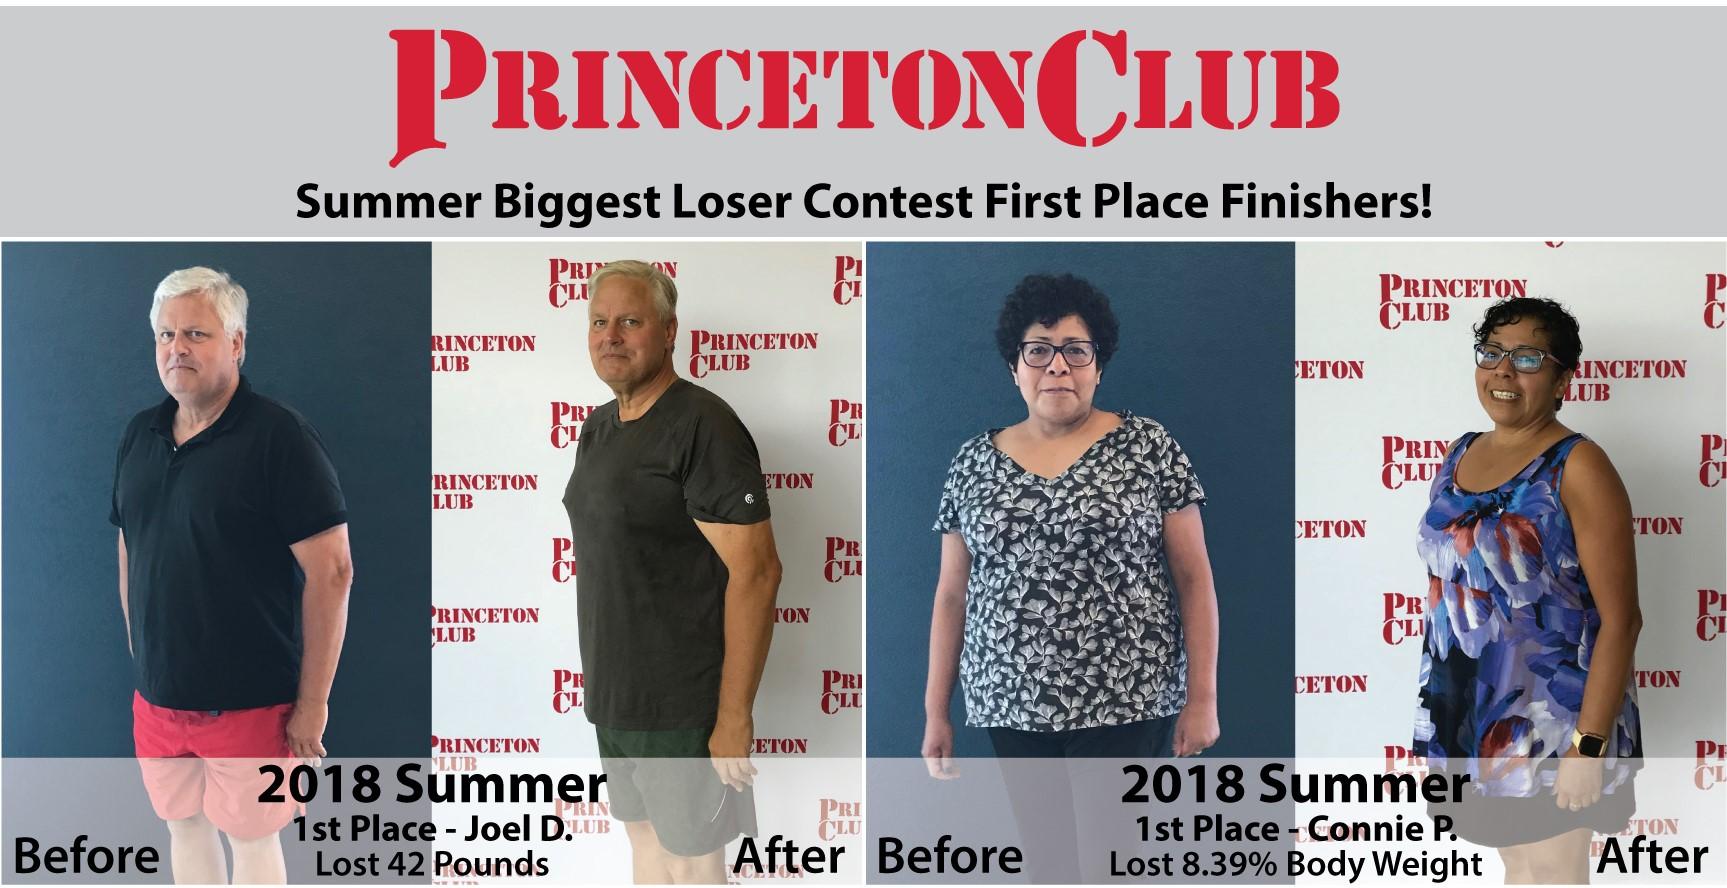 Biggest Loser Contest | Madison West | Princeton Club